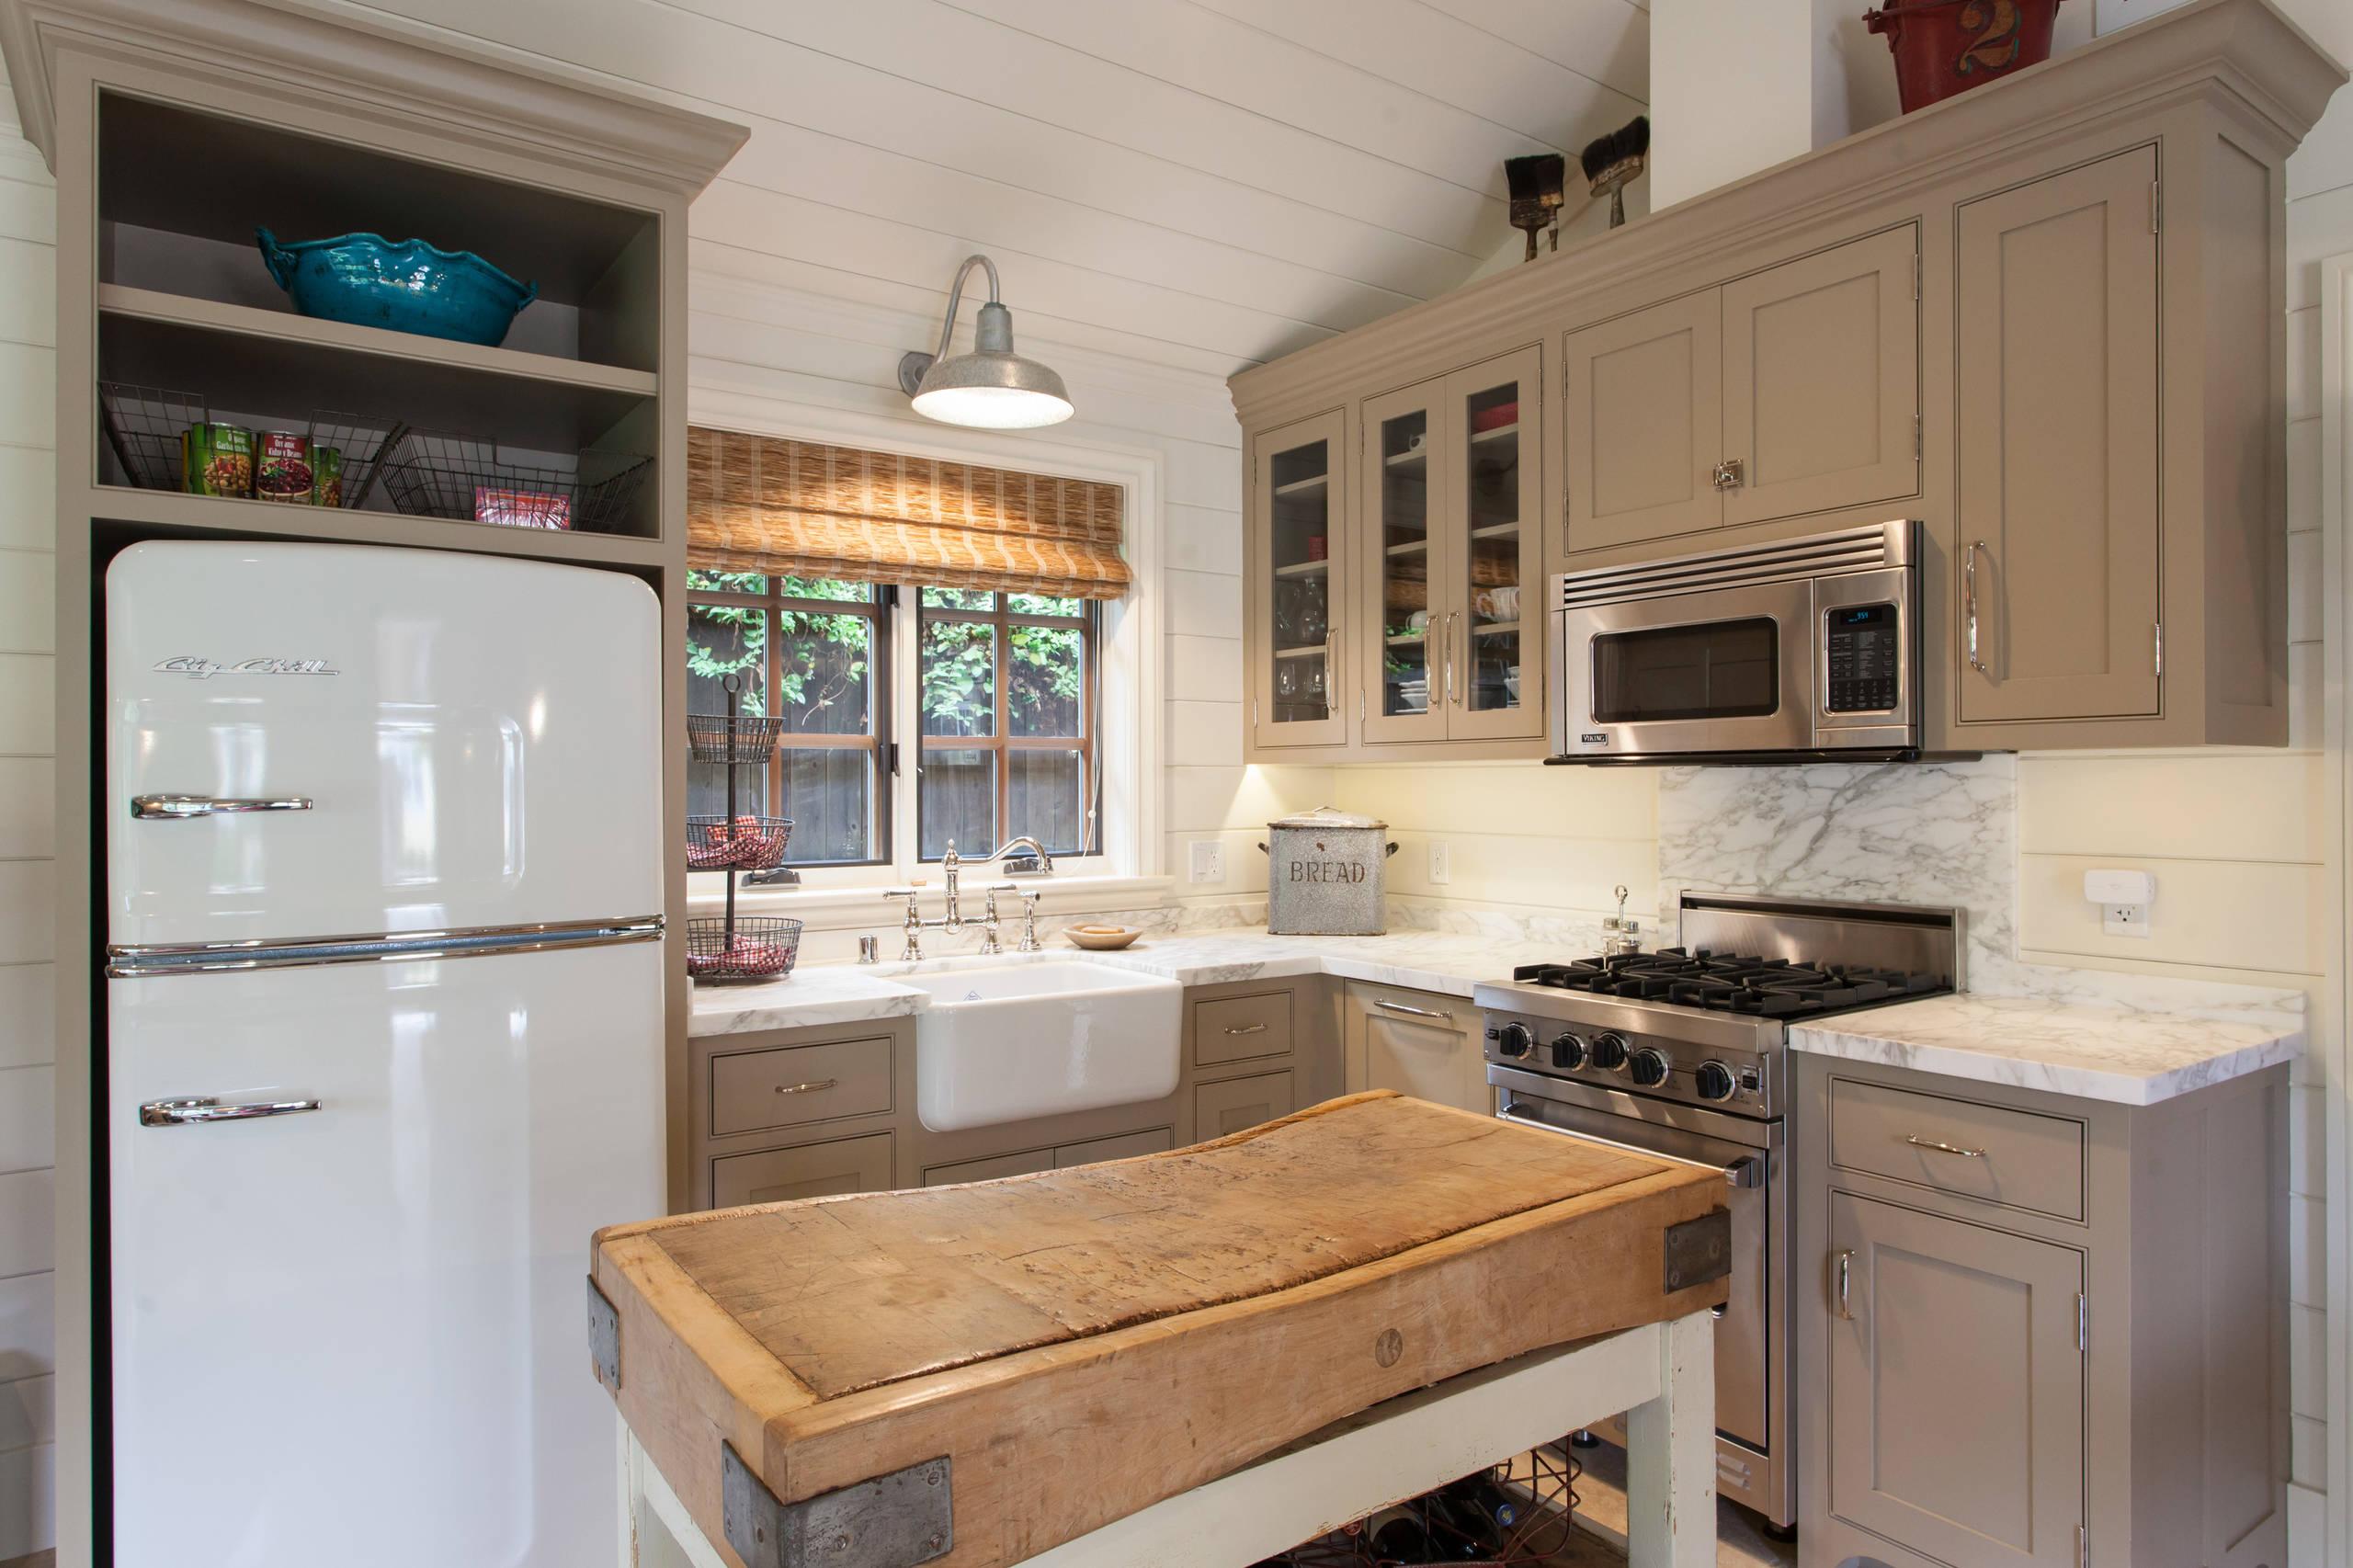 75 Beautiful Small Farmhouse Kitchen Pictures Ideas April 2021 Houzz